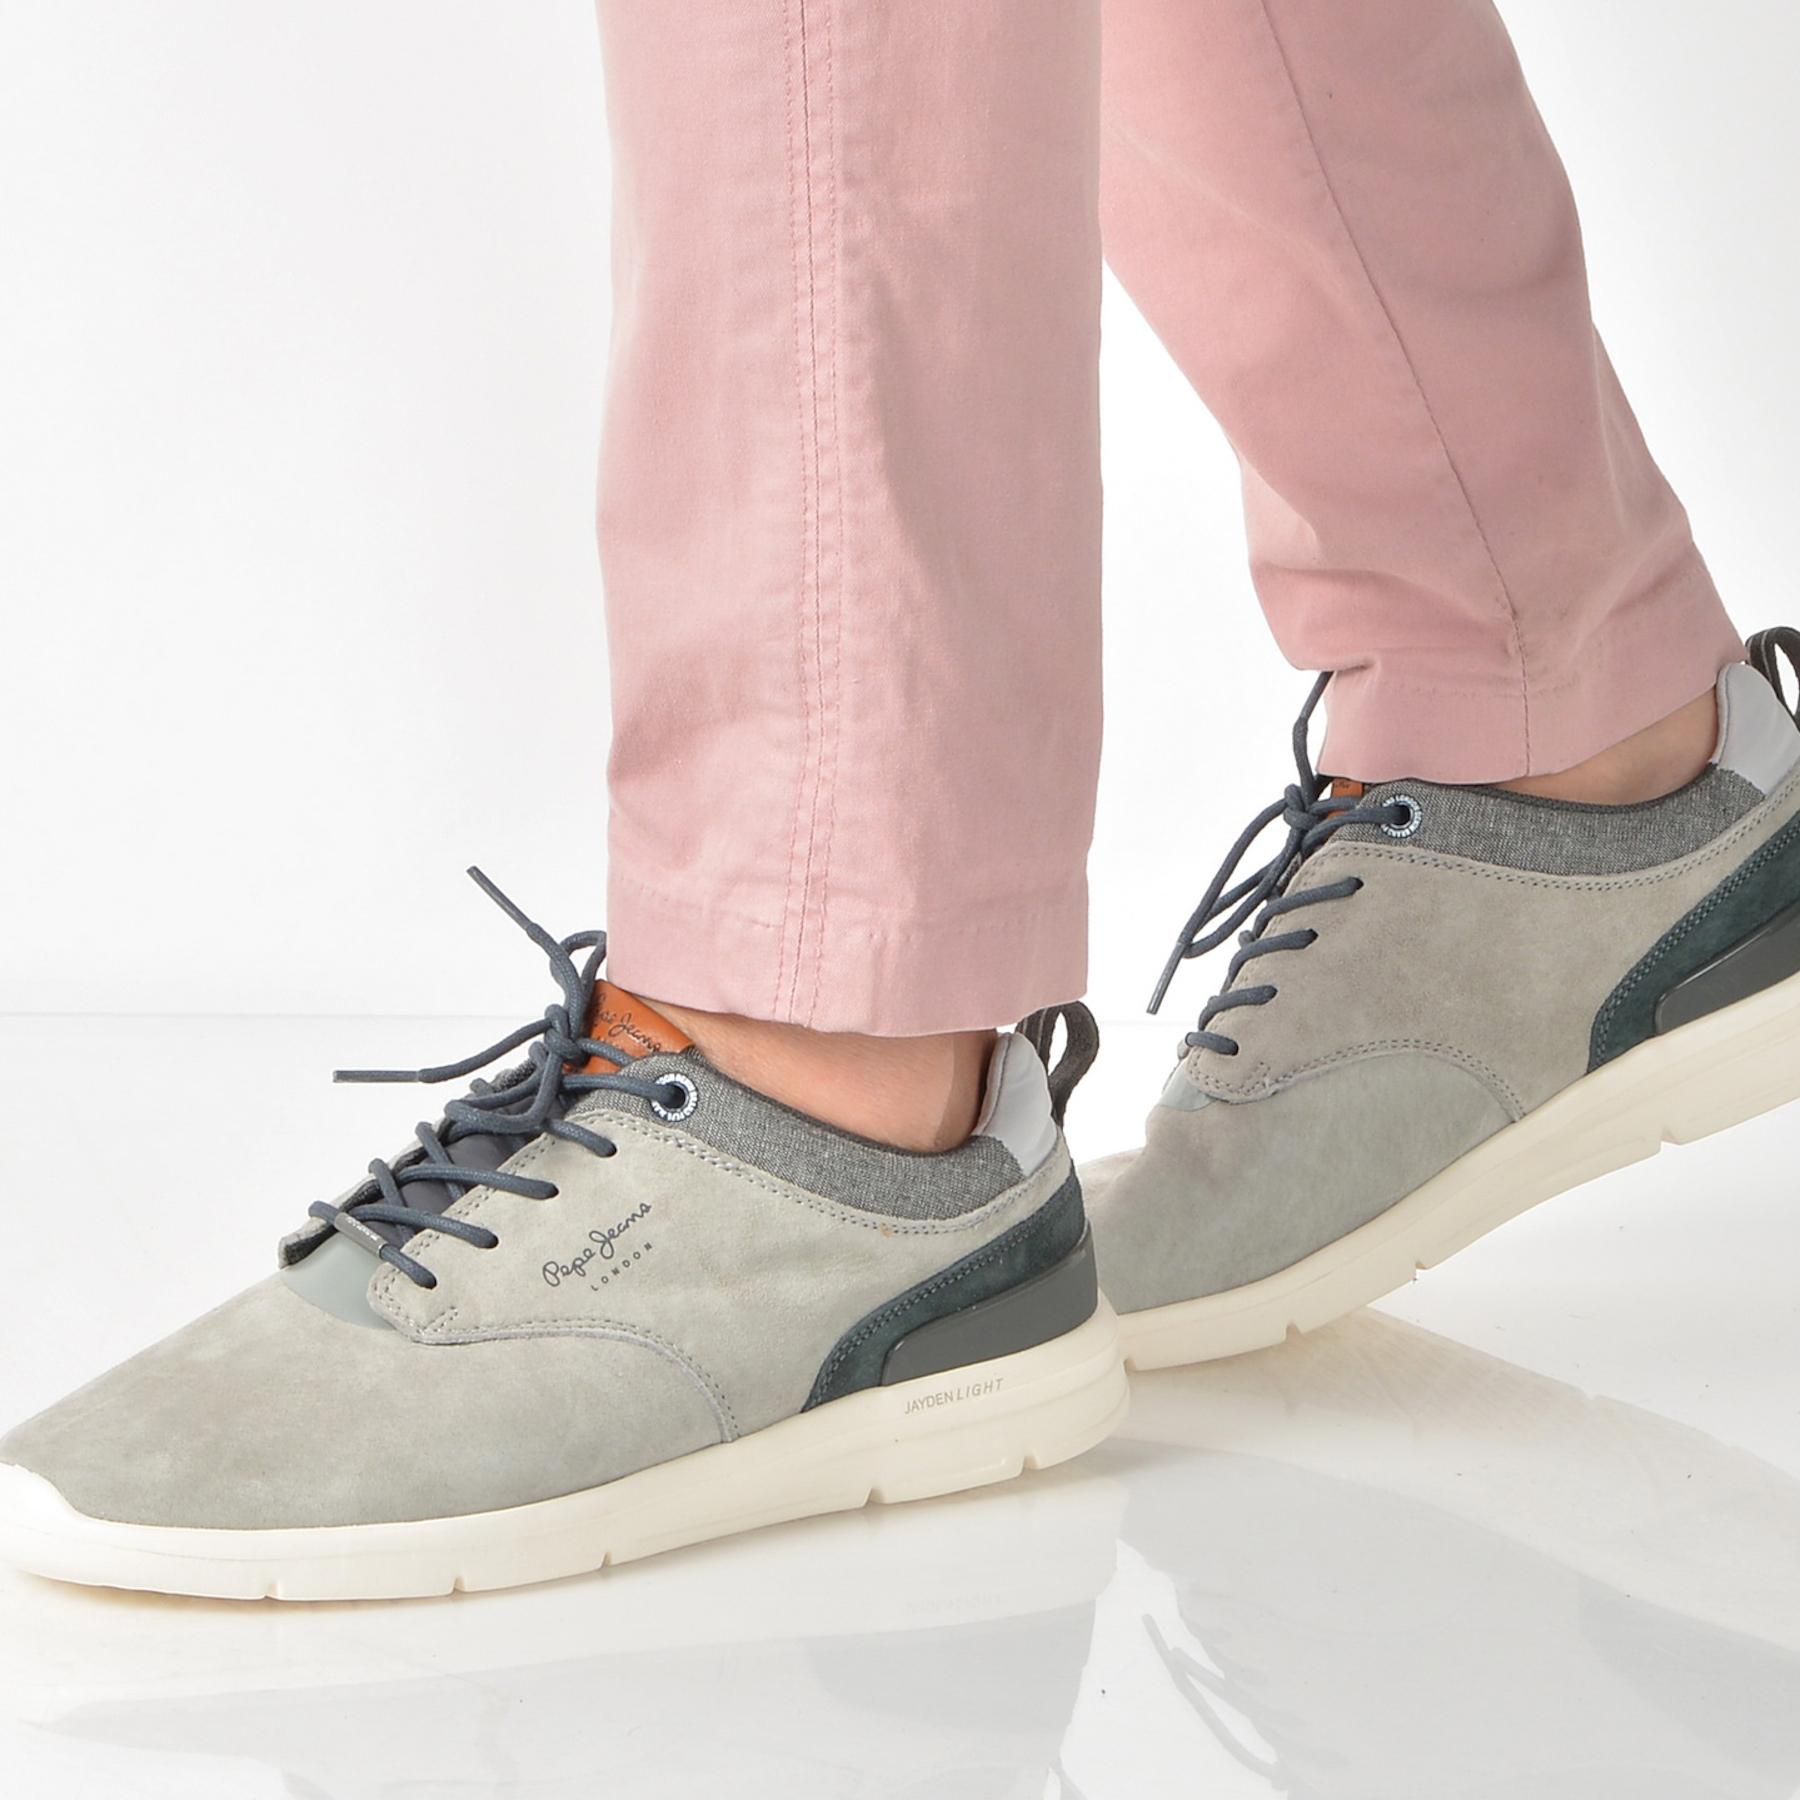 Pantofi Sport Pepe Jeans Gri, Ms30409, Din Piele Naturala